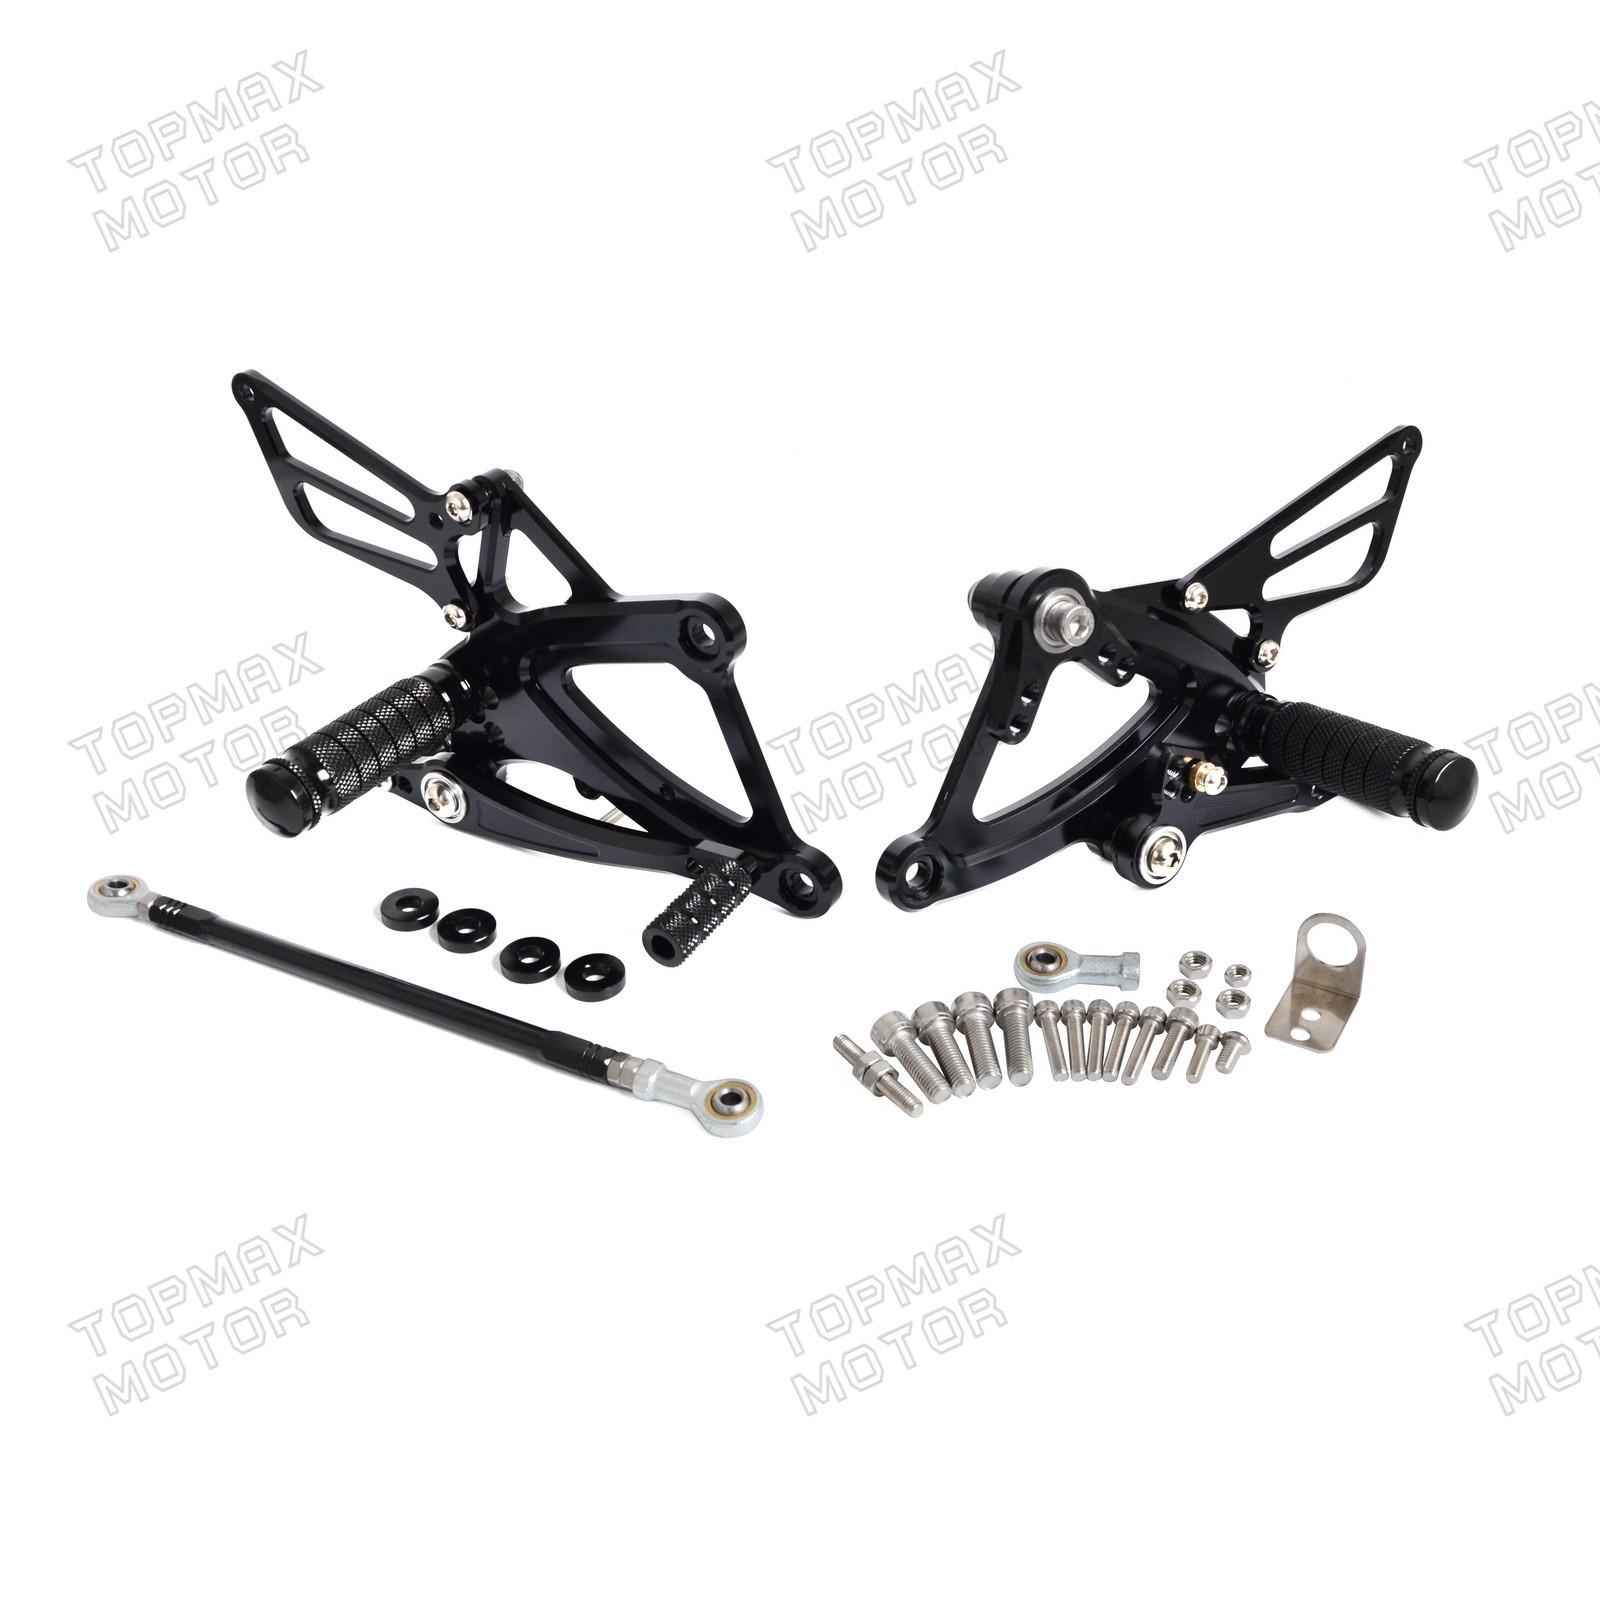 CNC Rearsets FootPeg Footrest For Honda CBR500R//400R CB500F//400F 2013-2015 Red